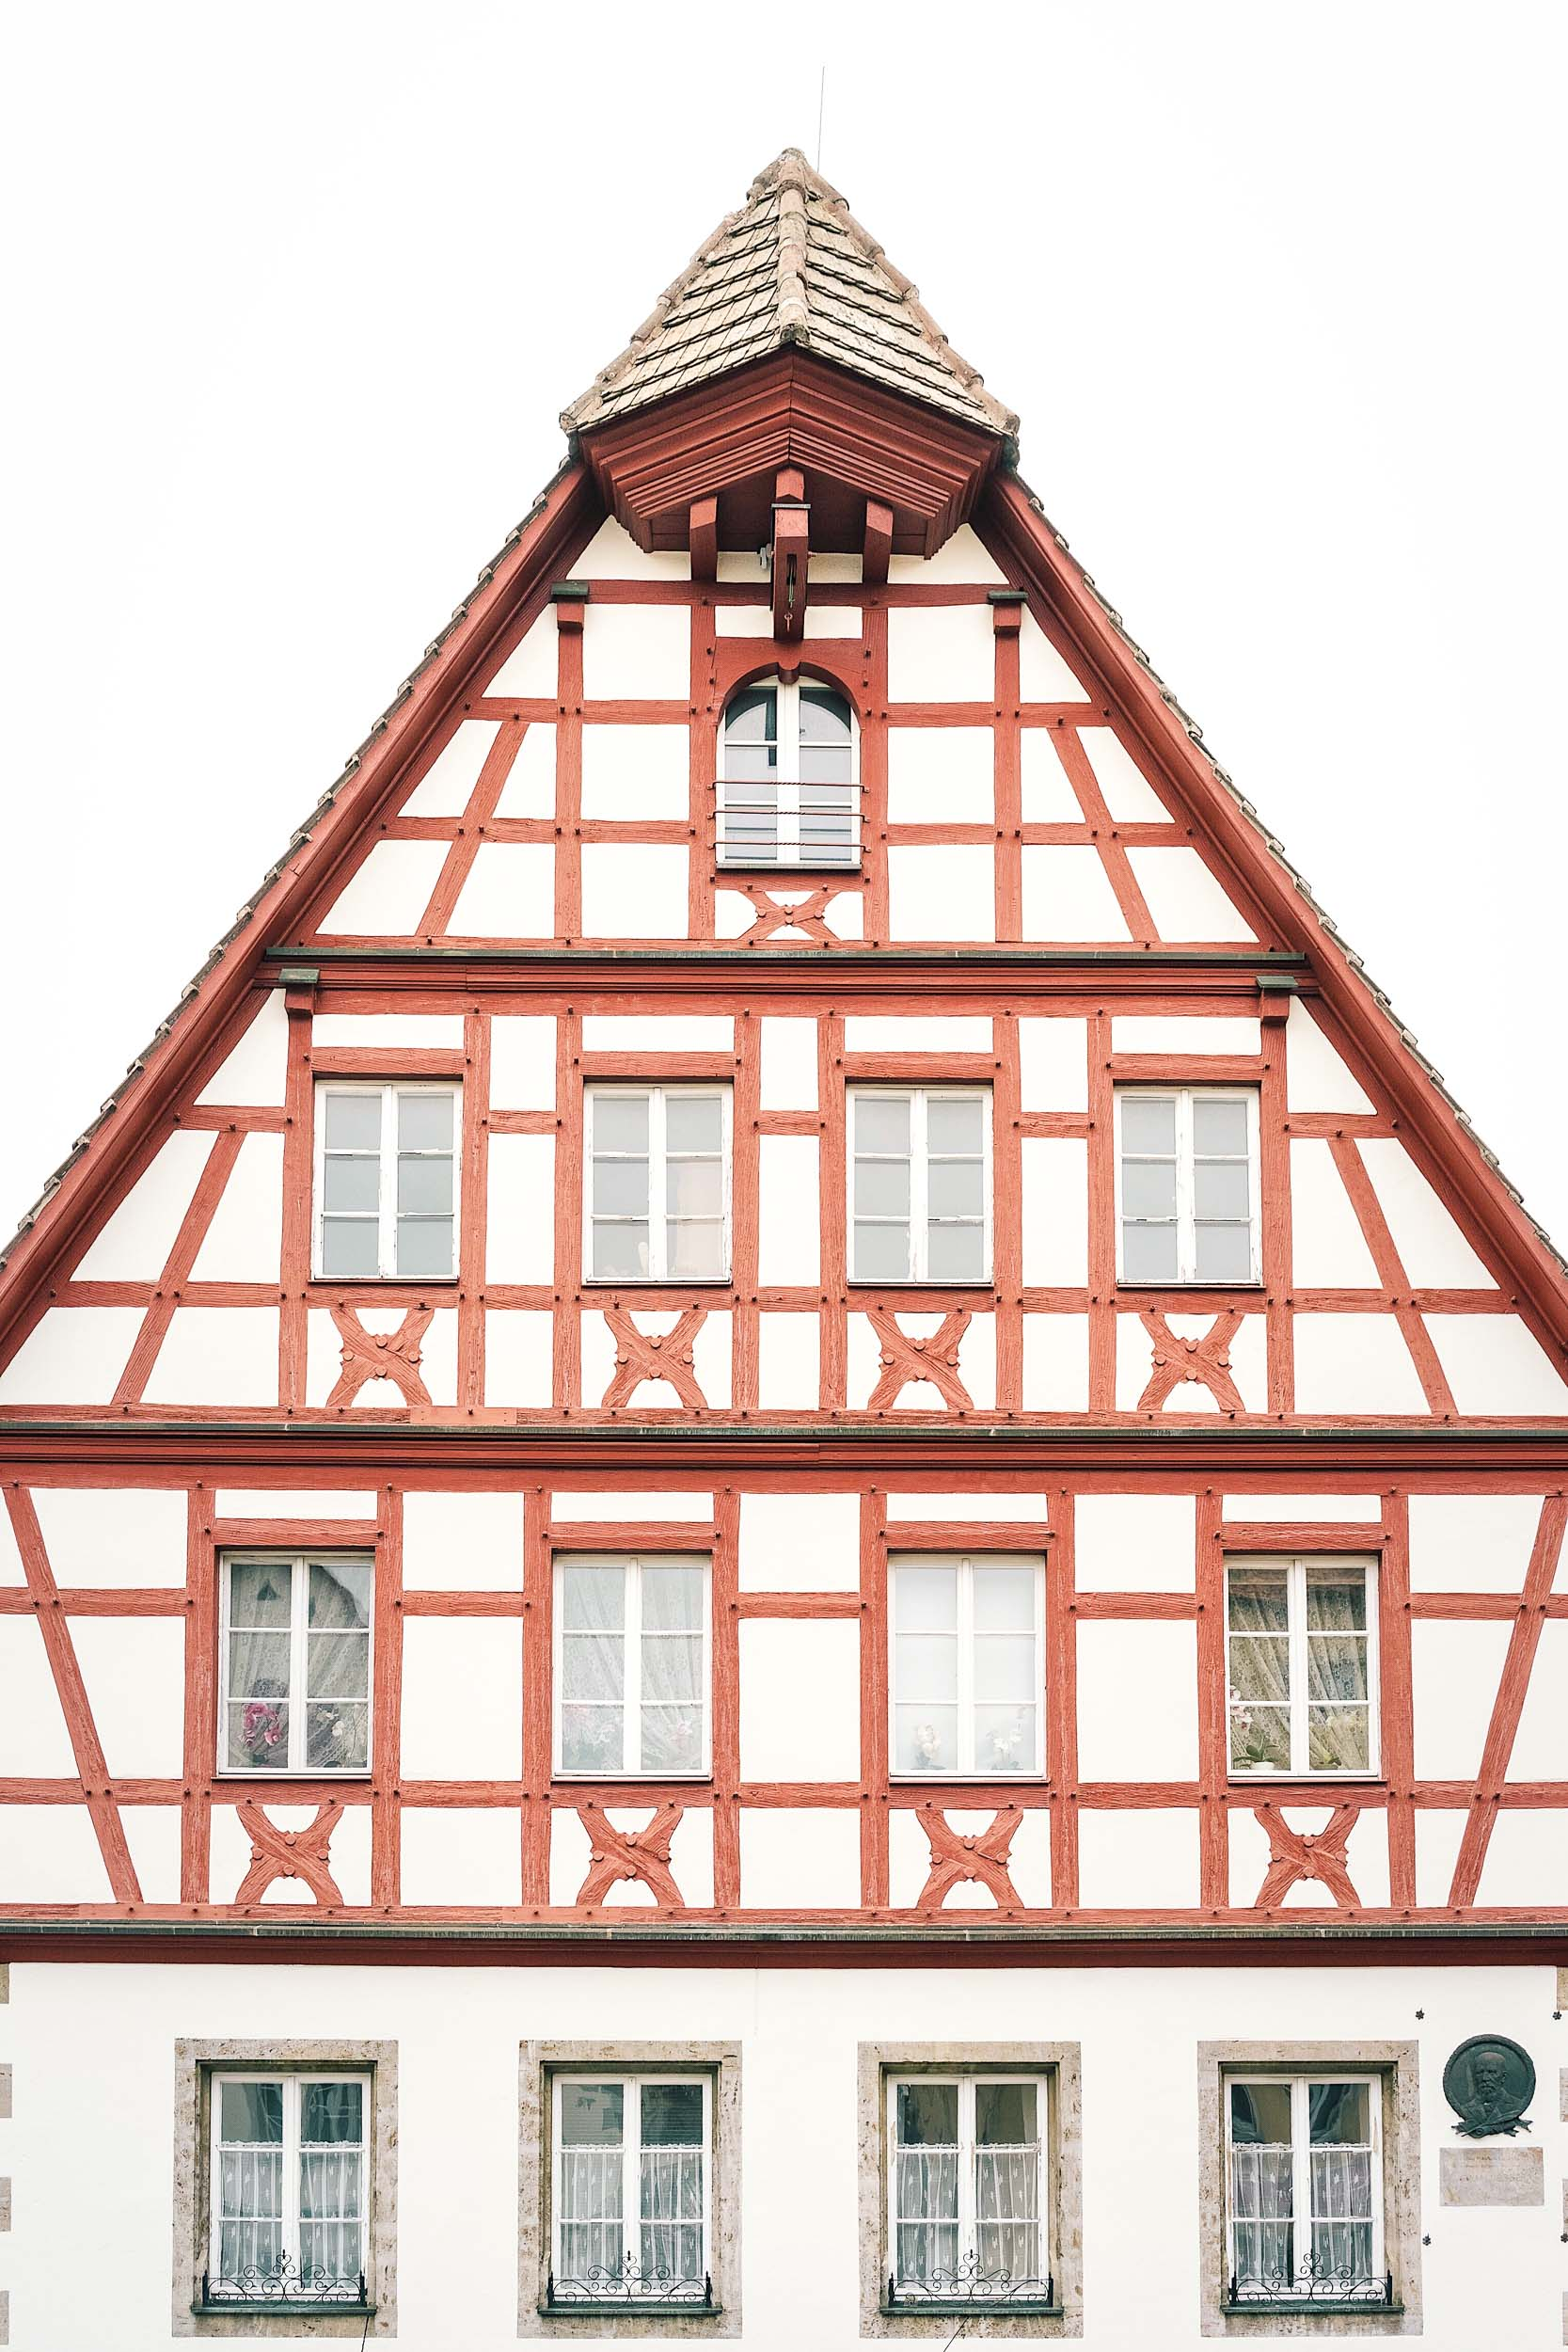 A German medieval building in Rothenburg